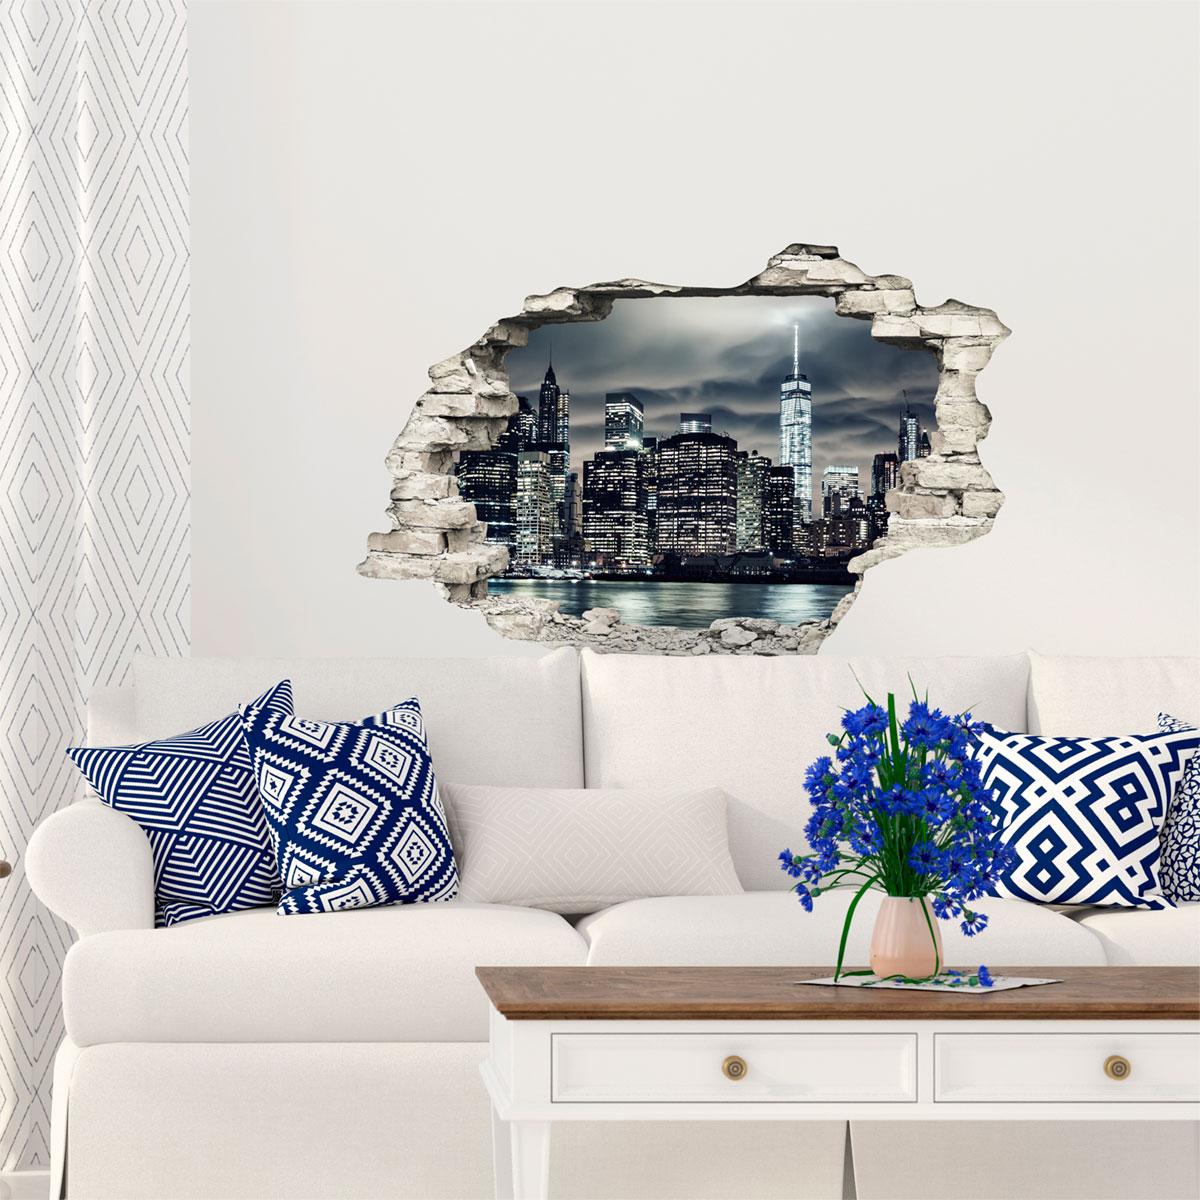 sticker trompe l 39 oeil nuit magique new york stickers villes et voyages new york ambiance. Black Bedroom Furniture Sets. Home Design Ideas